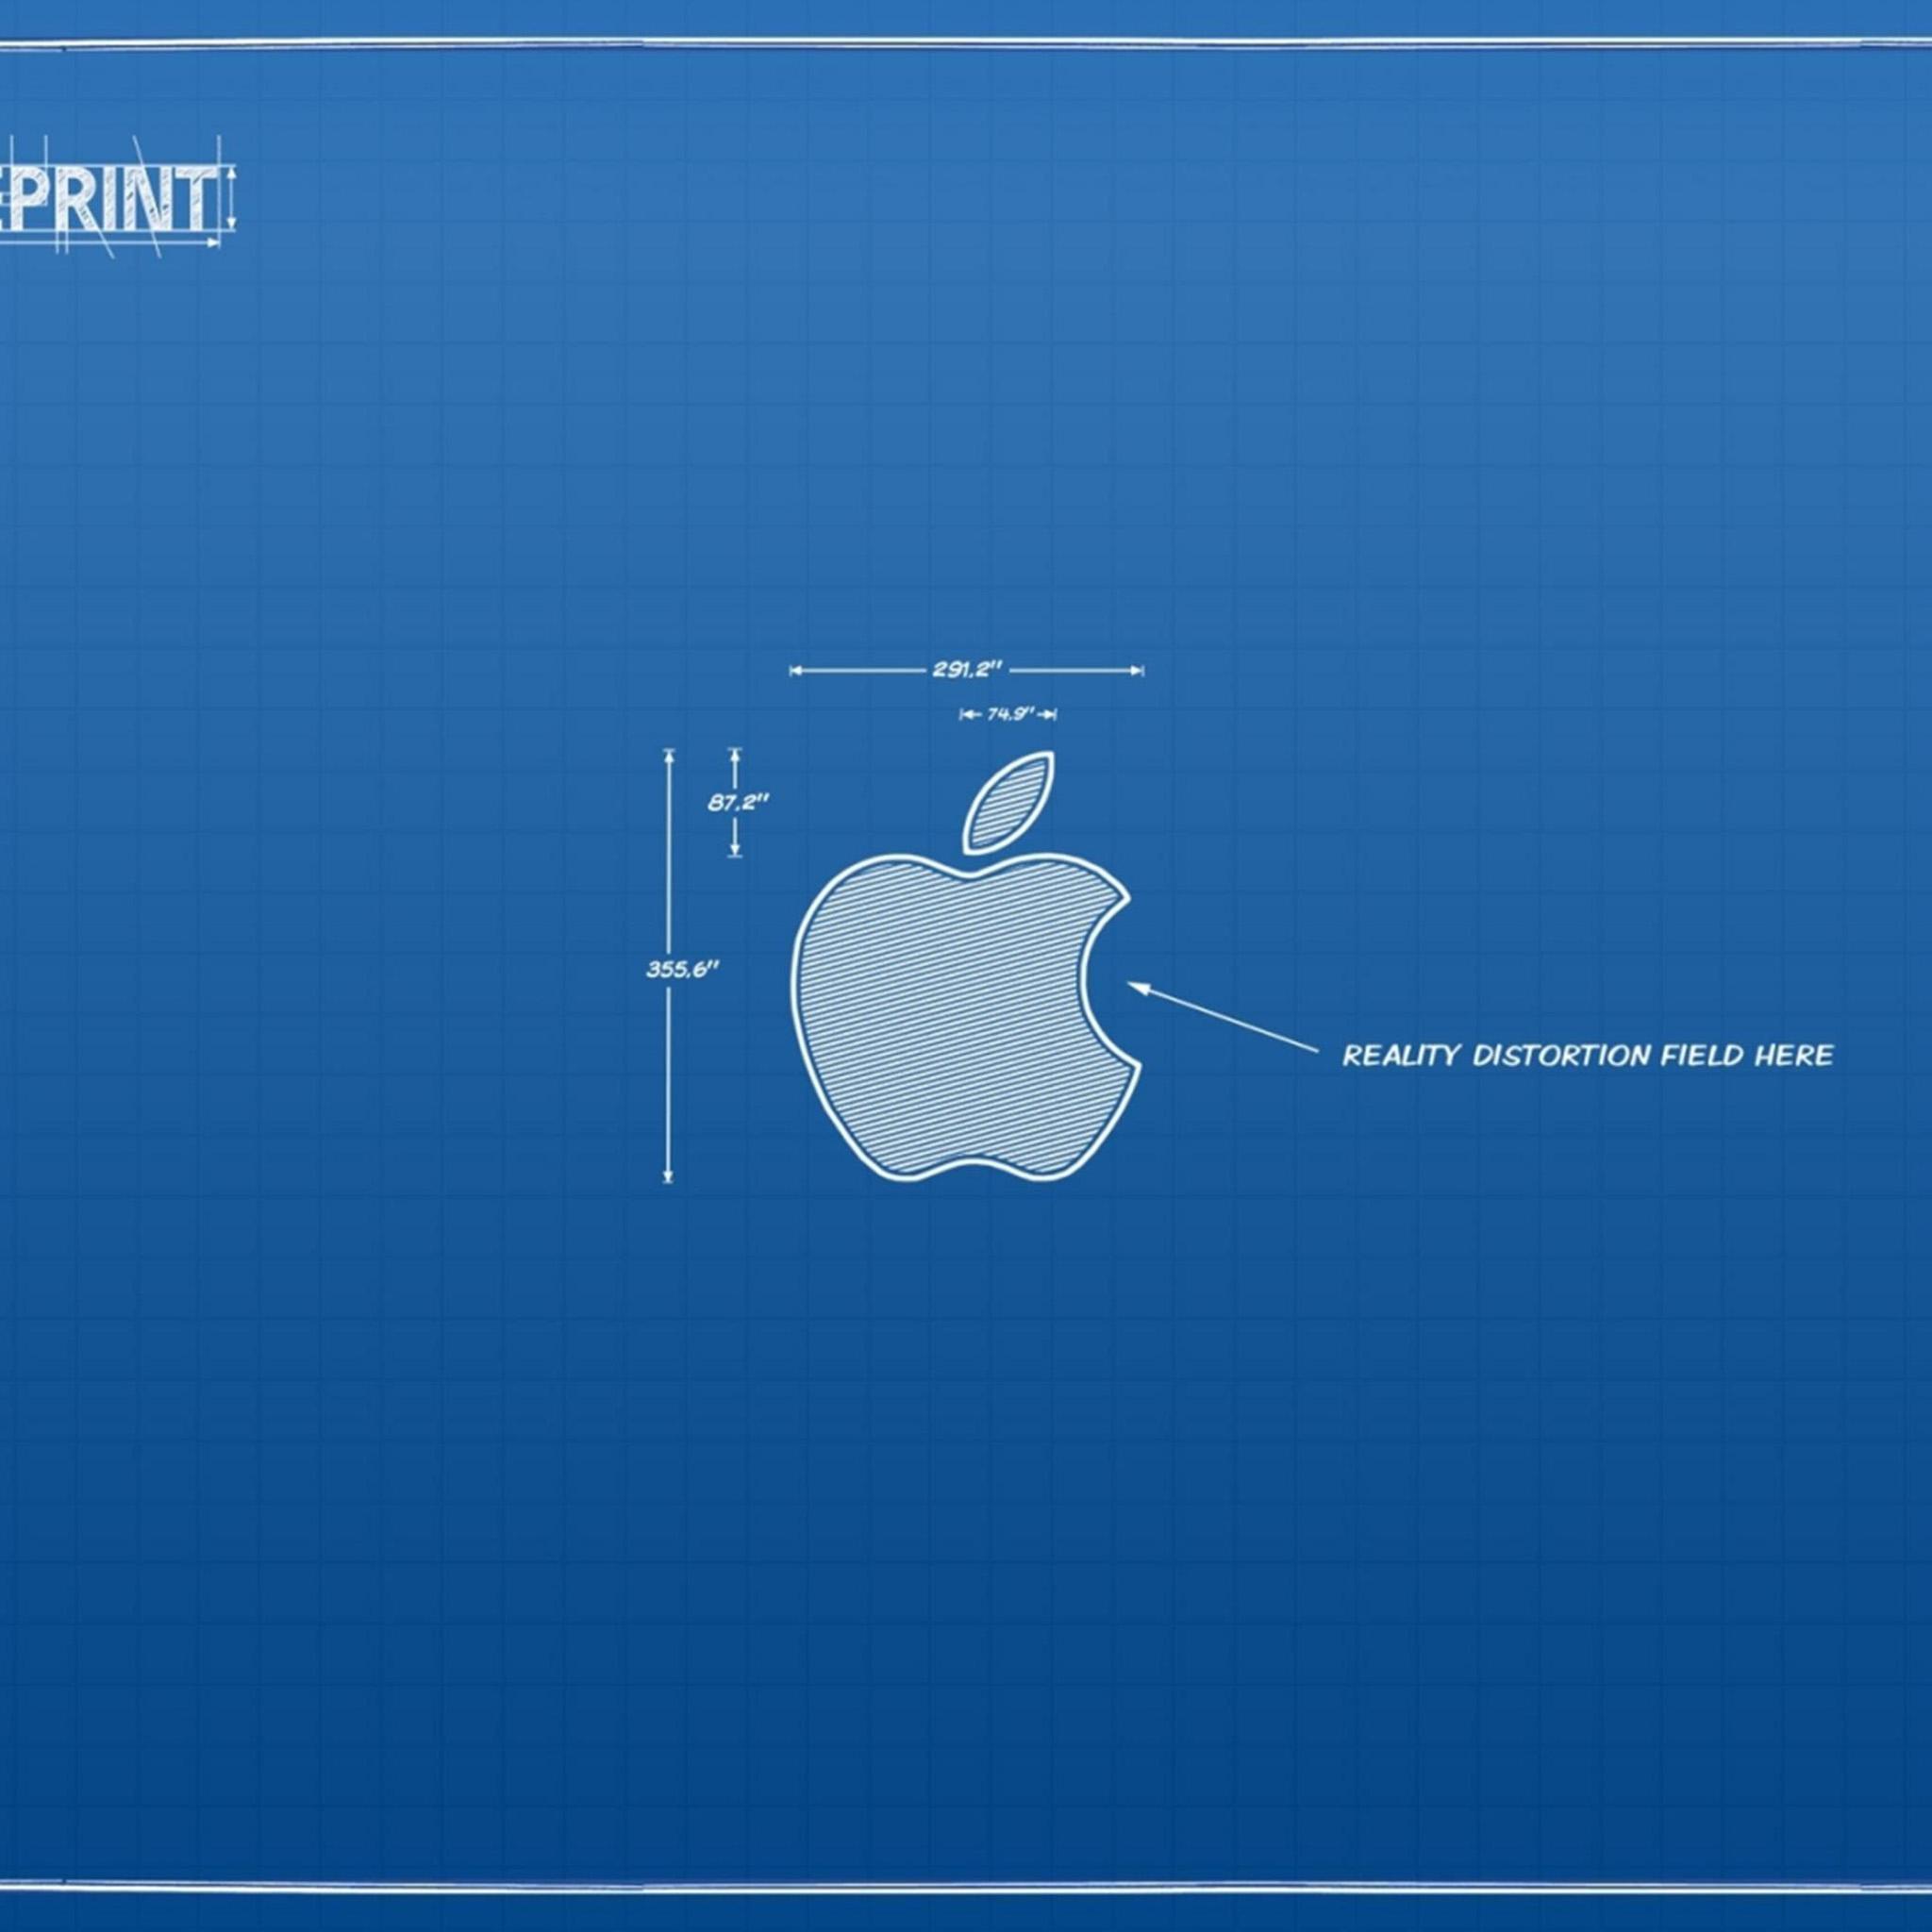 Ipad air 2 wallpaper wallpapersafari - Ipad air moving wallpaper ...